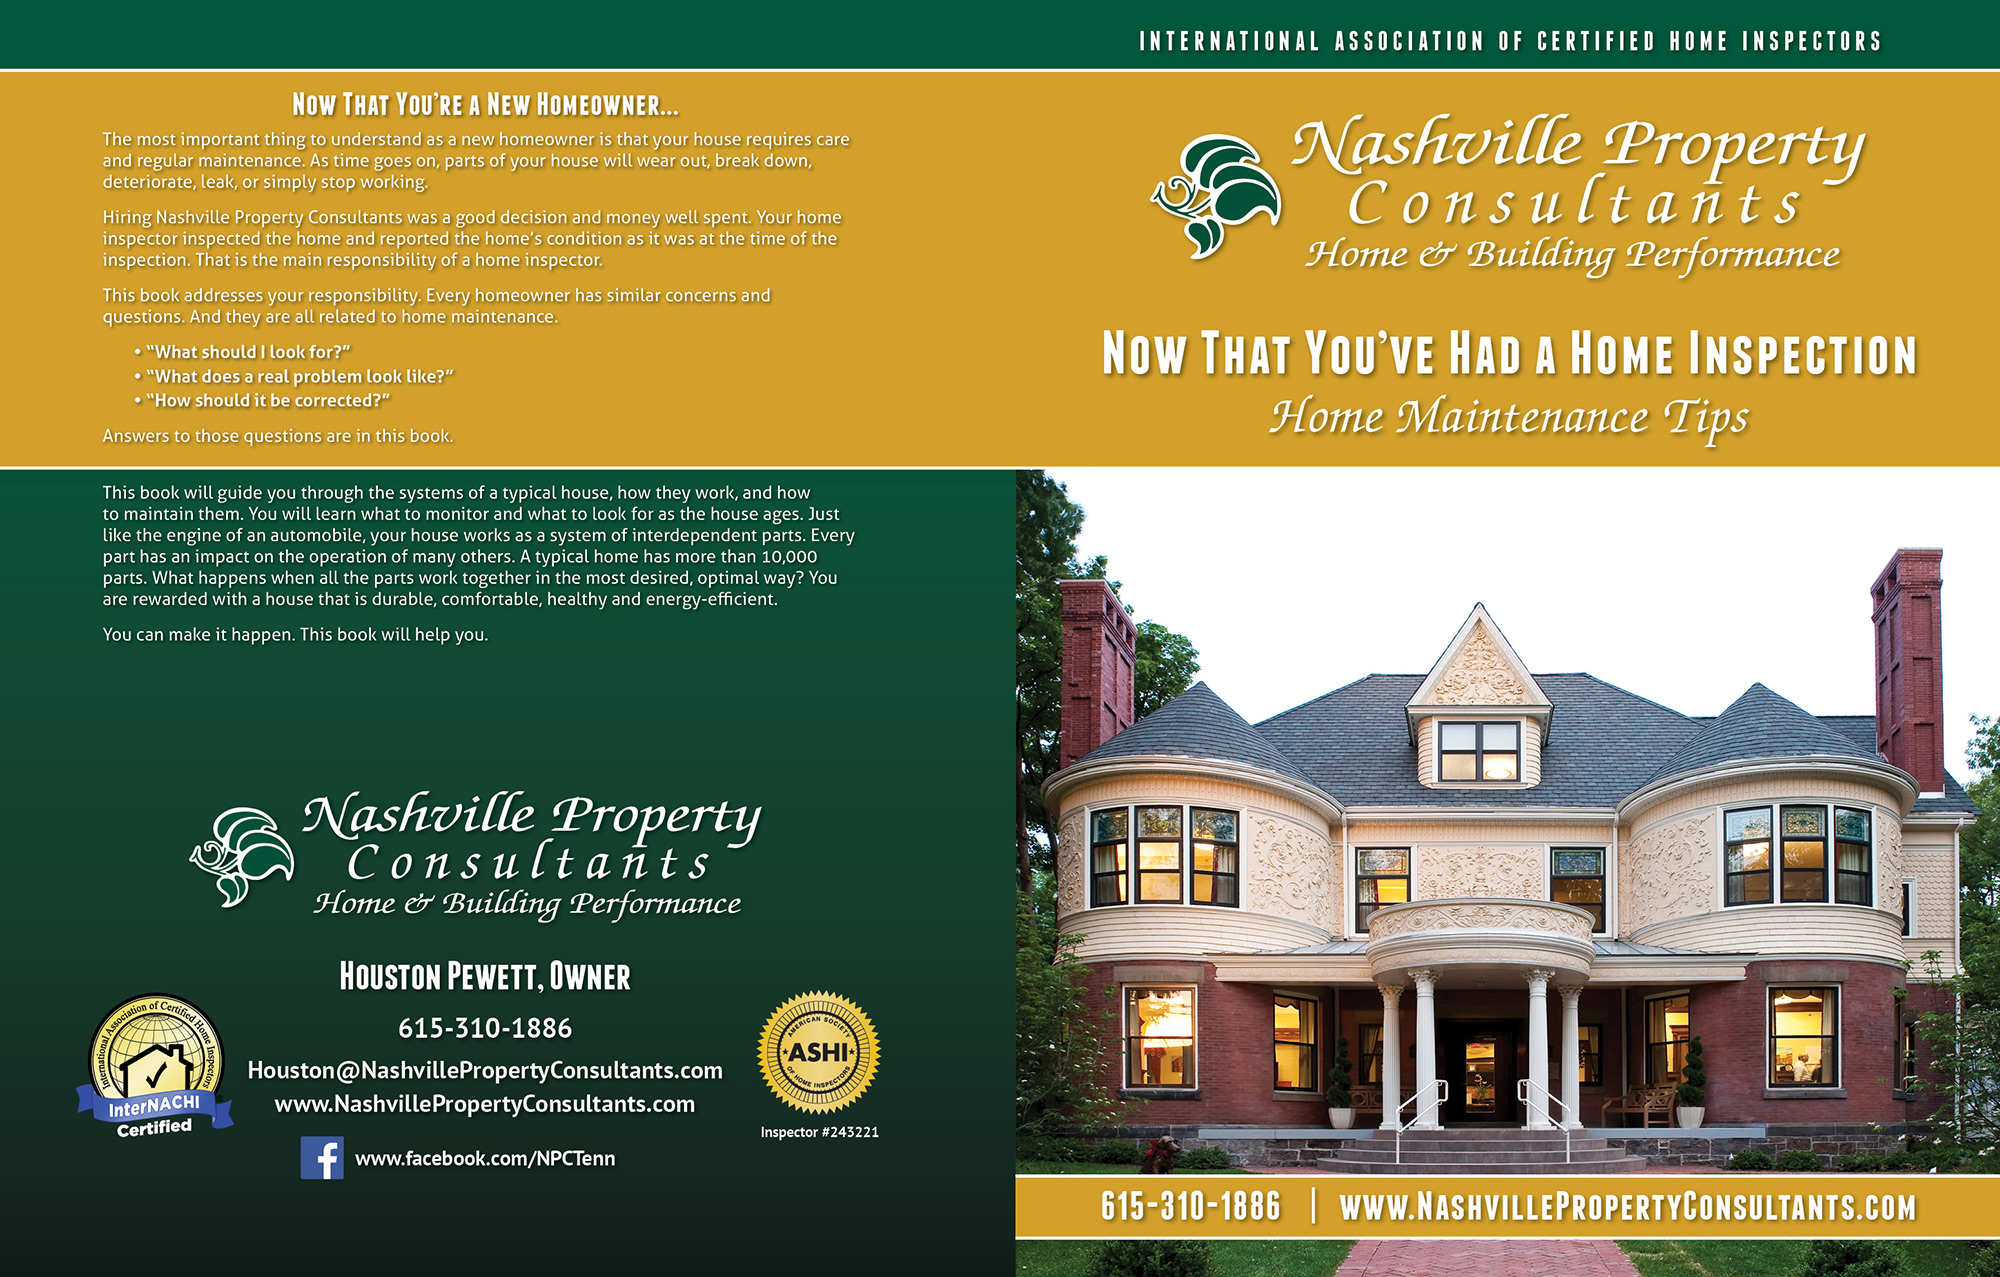 Custom Home Maintenance Book For Nashville Property Consultants Inspection Gallery Internachi